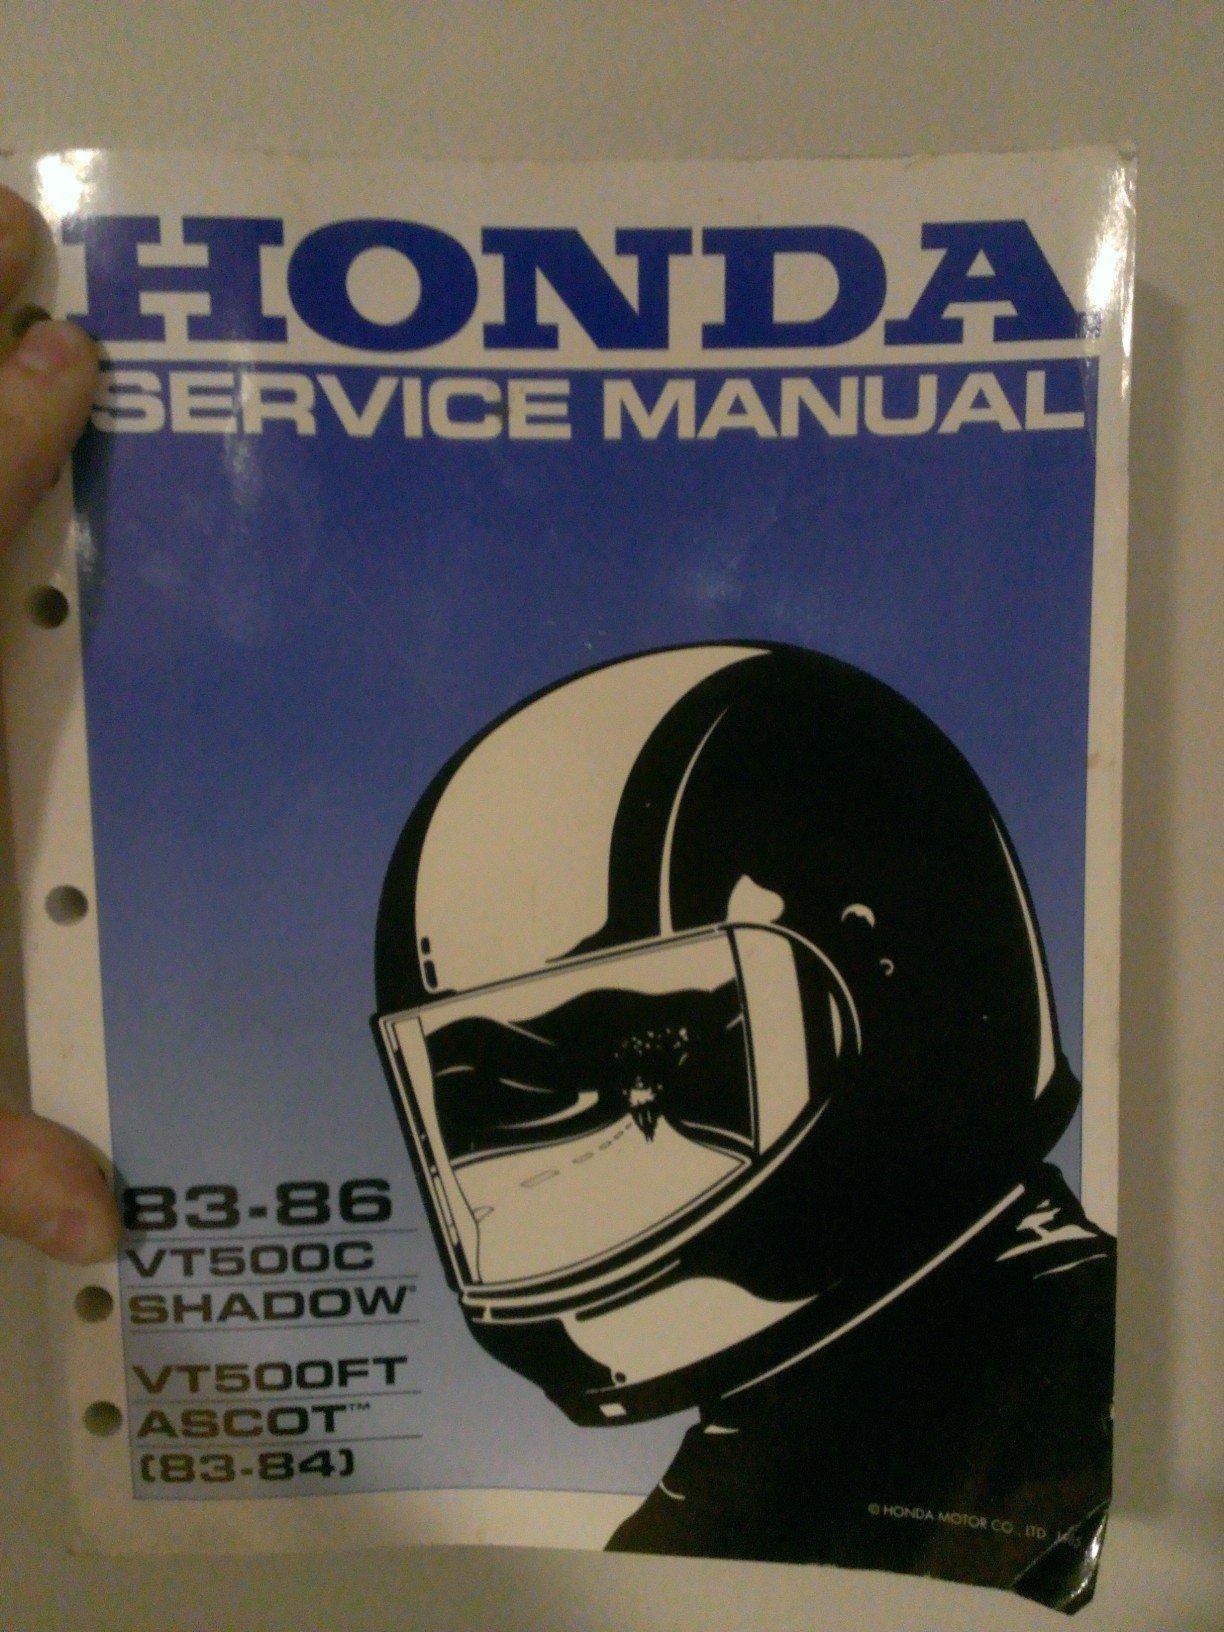 Honda Factory Service Manual 1983-1986 (VT500C Shadow (1983-1986) and  VT500FT Ascot (83-84)): Honda Motor Co.: Amazon.com: Books